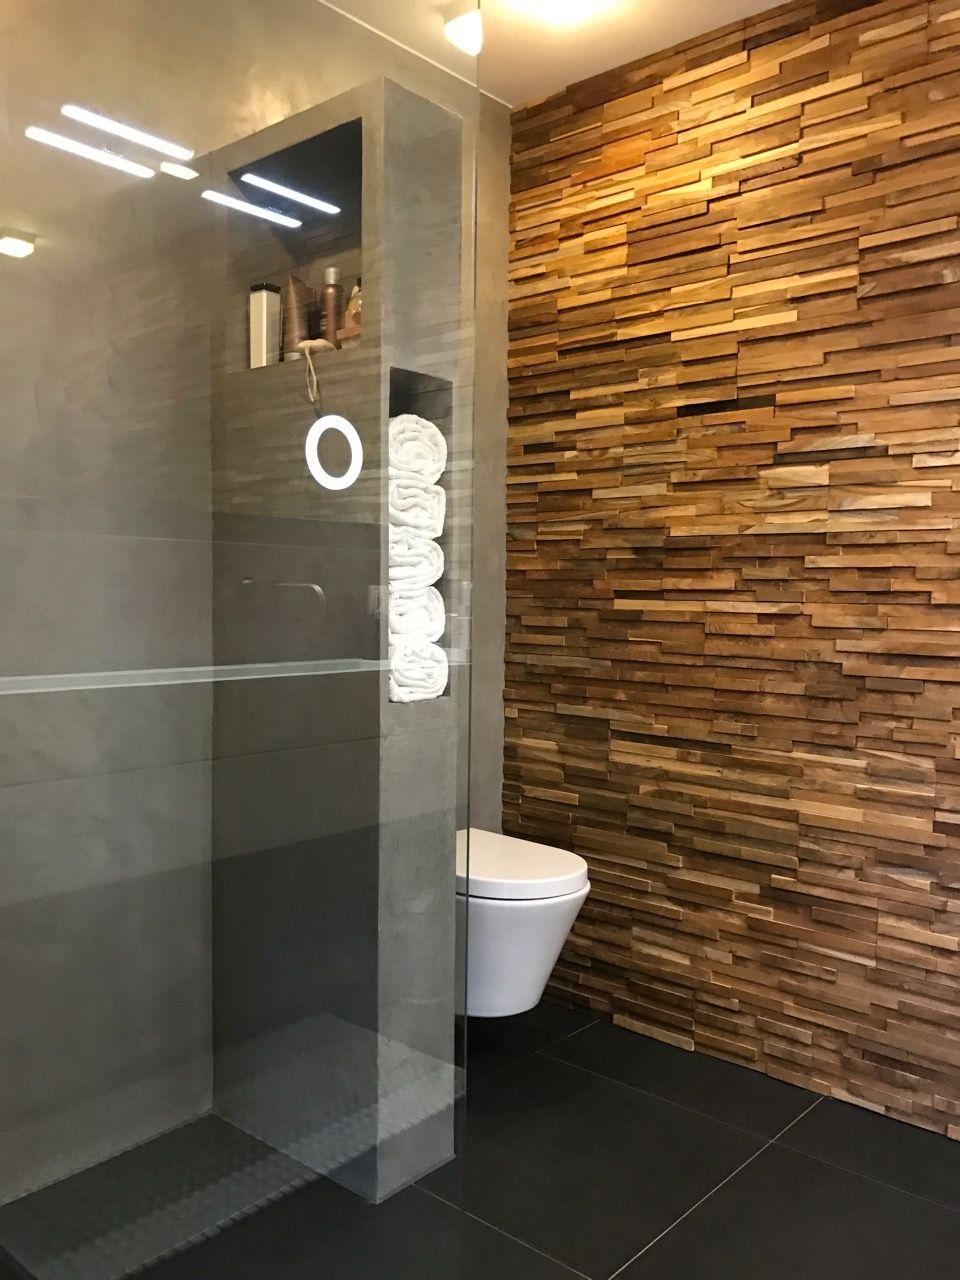 Hotel chique badkamer - Eigen Huis & Tuin   BADKAMERS   Pinterest ...